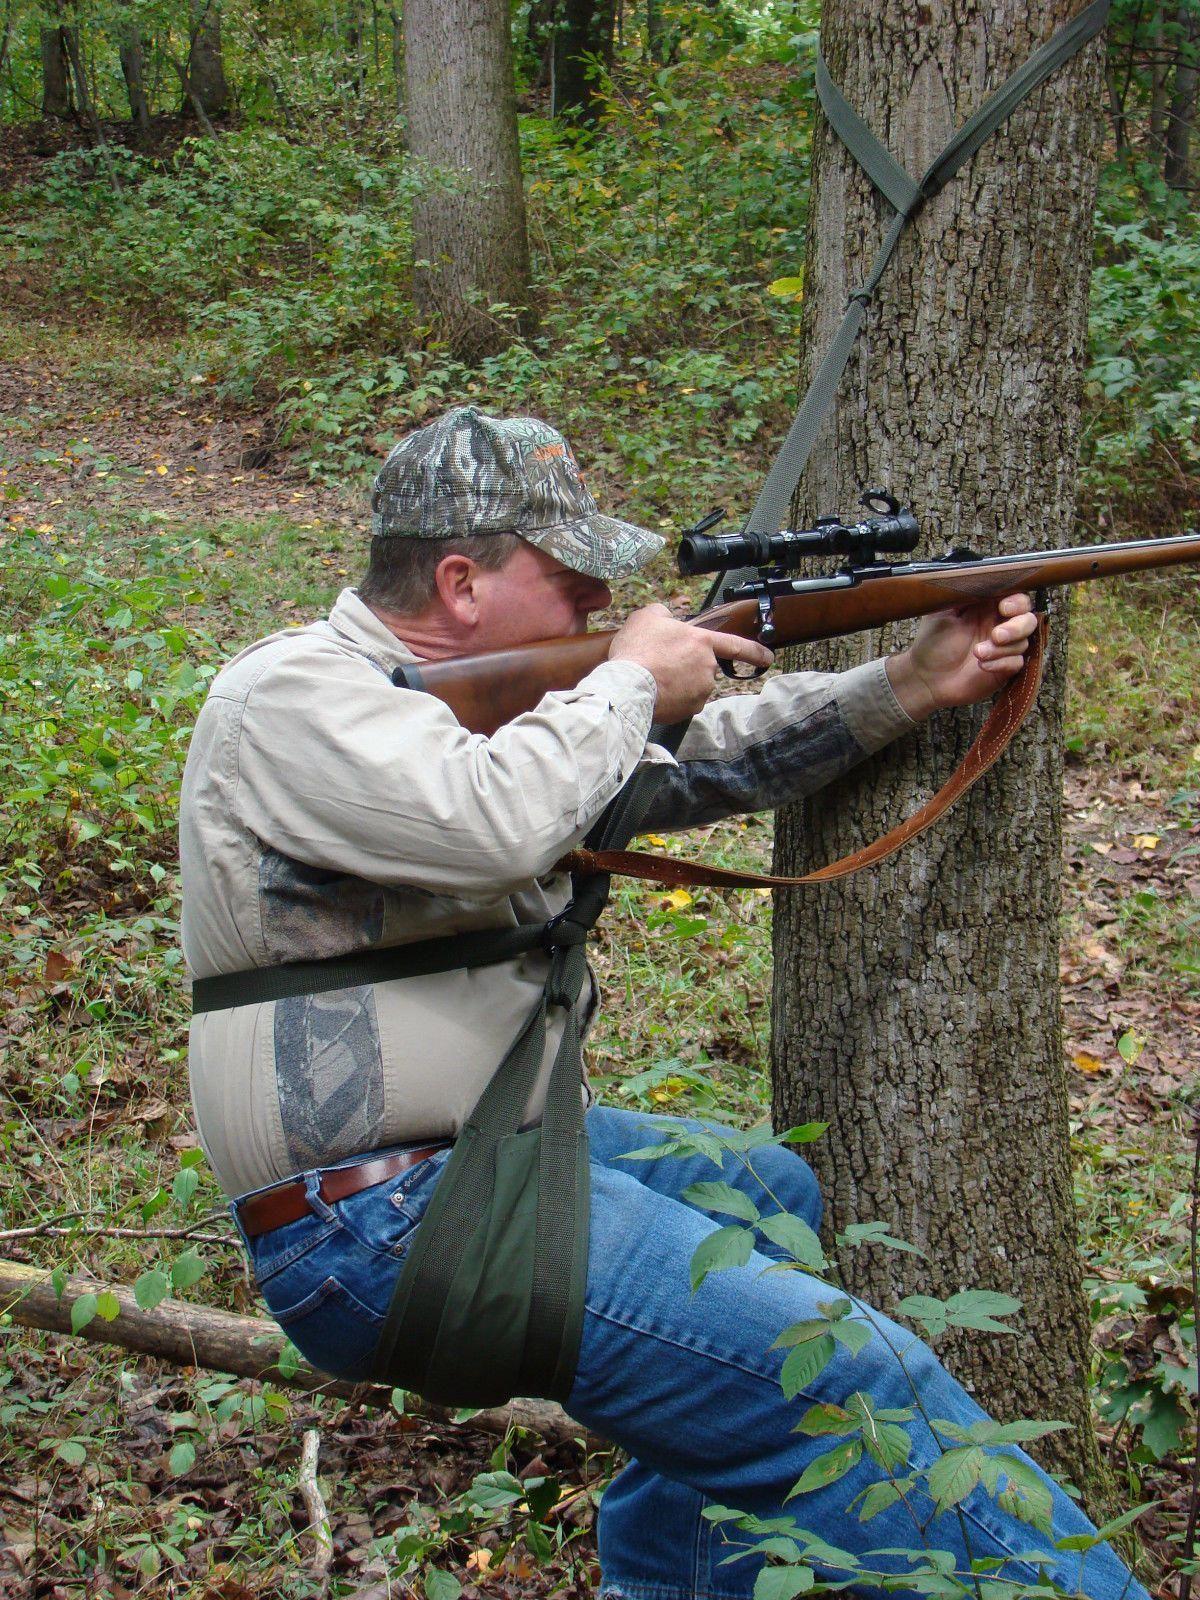 New Hunting HunterFishing Sturdy Portable Tree SeatAlso